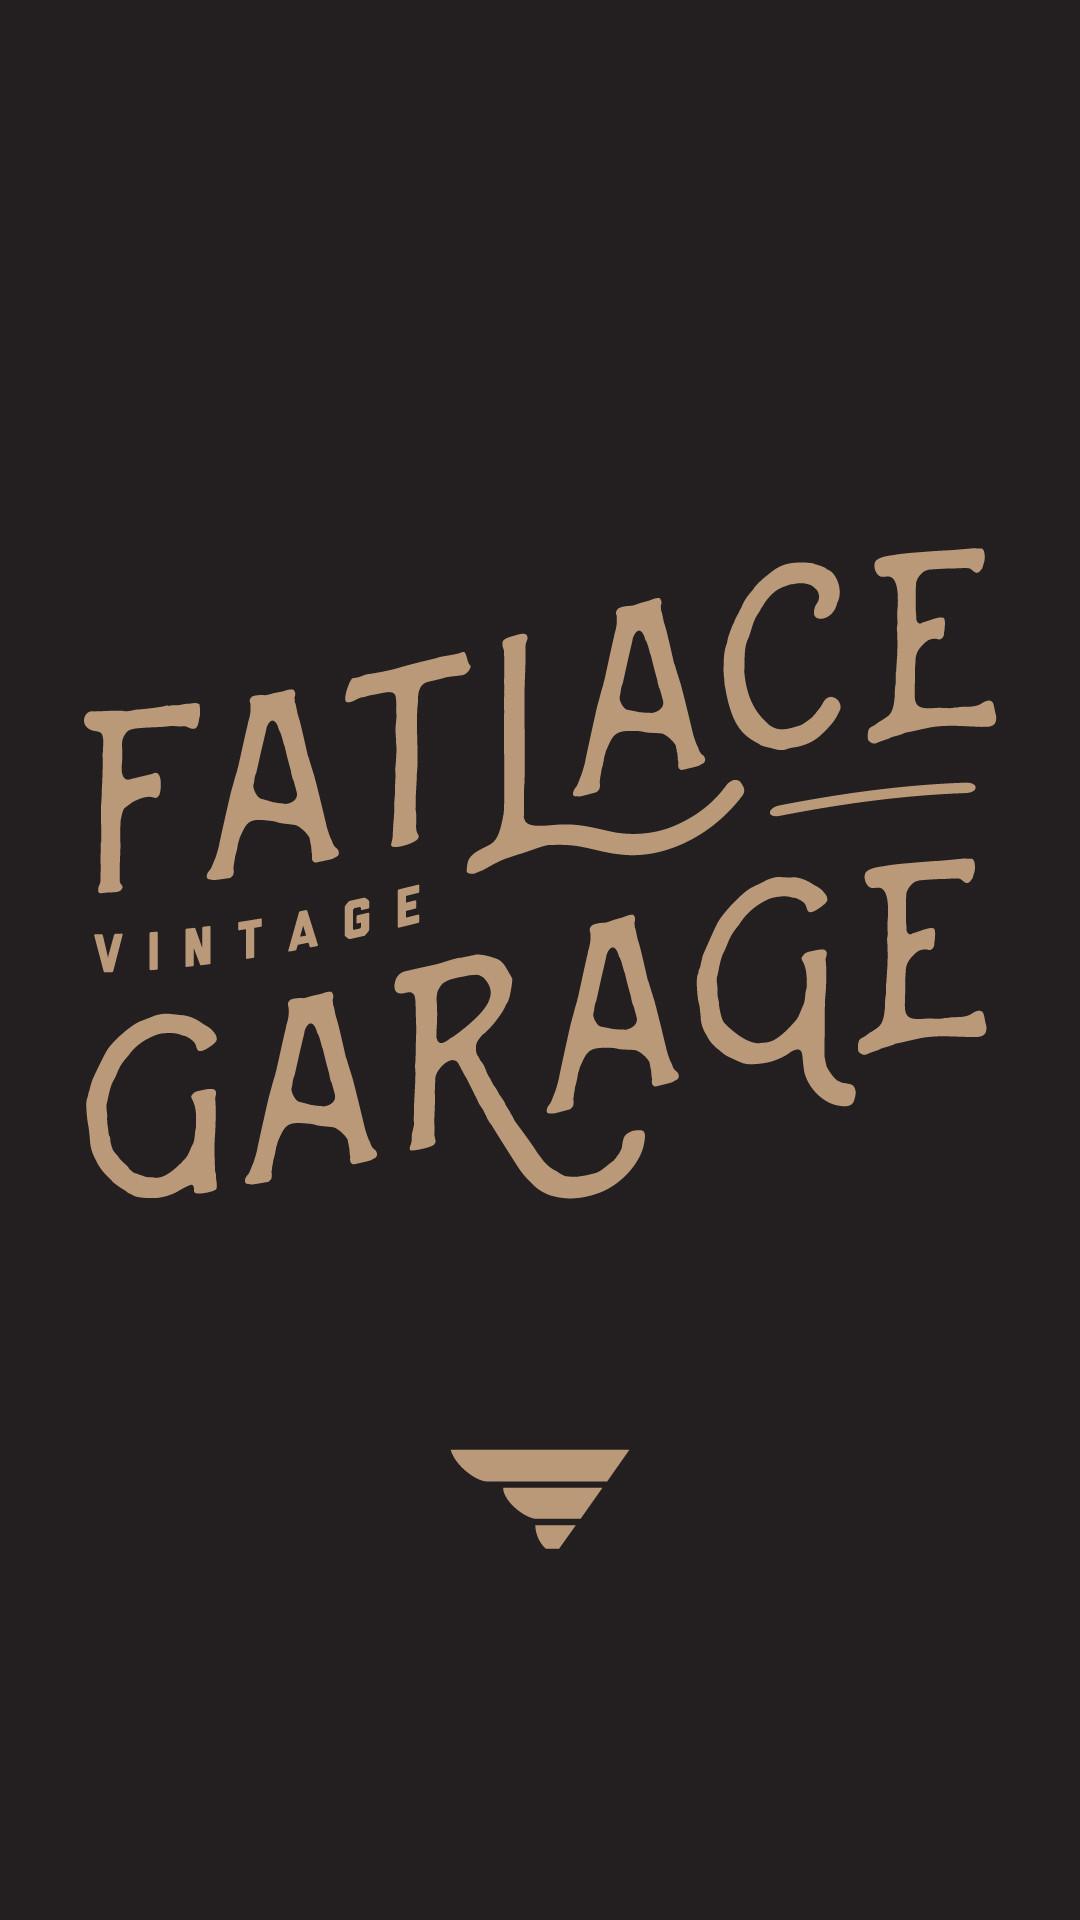 Wallpaper Wednesday: Fatlace Vintage Garage